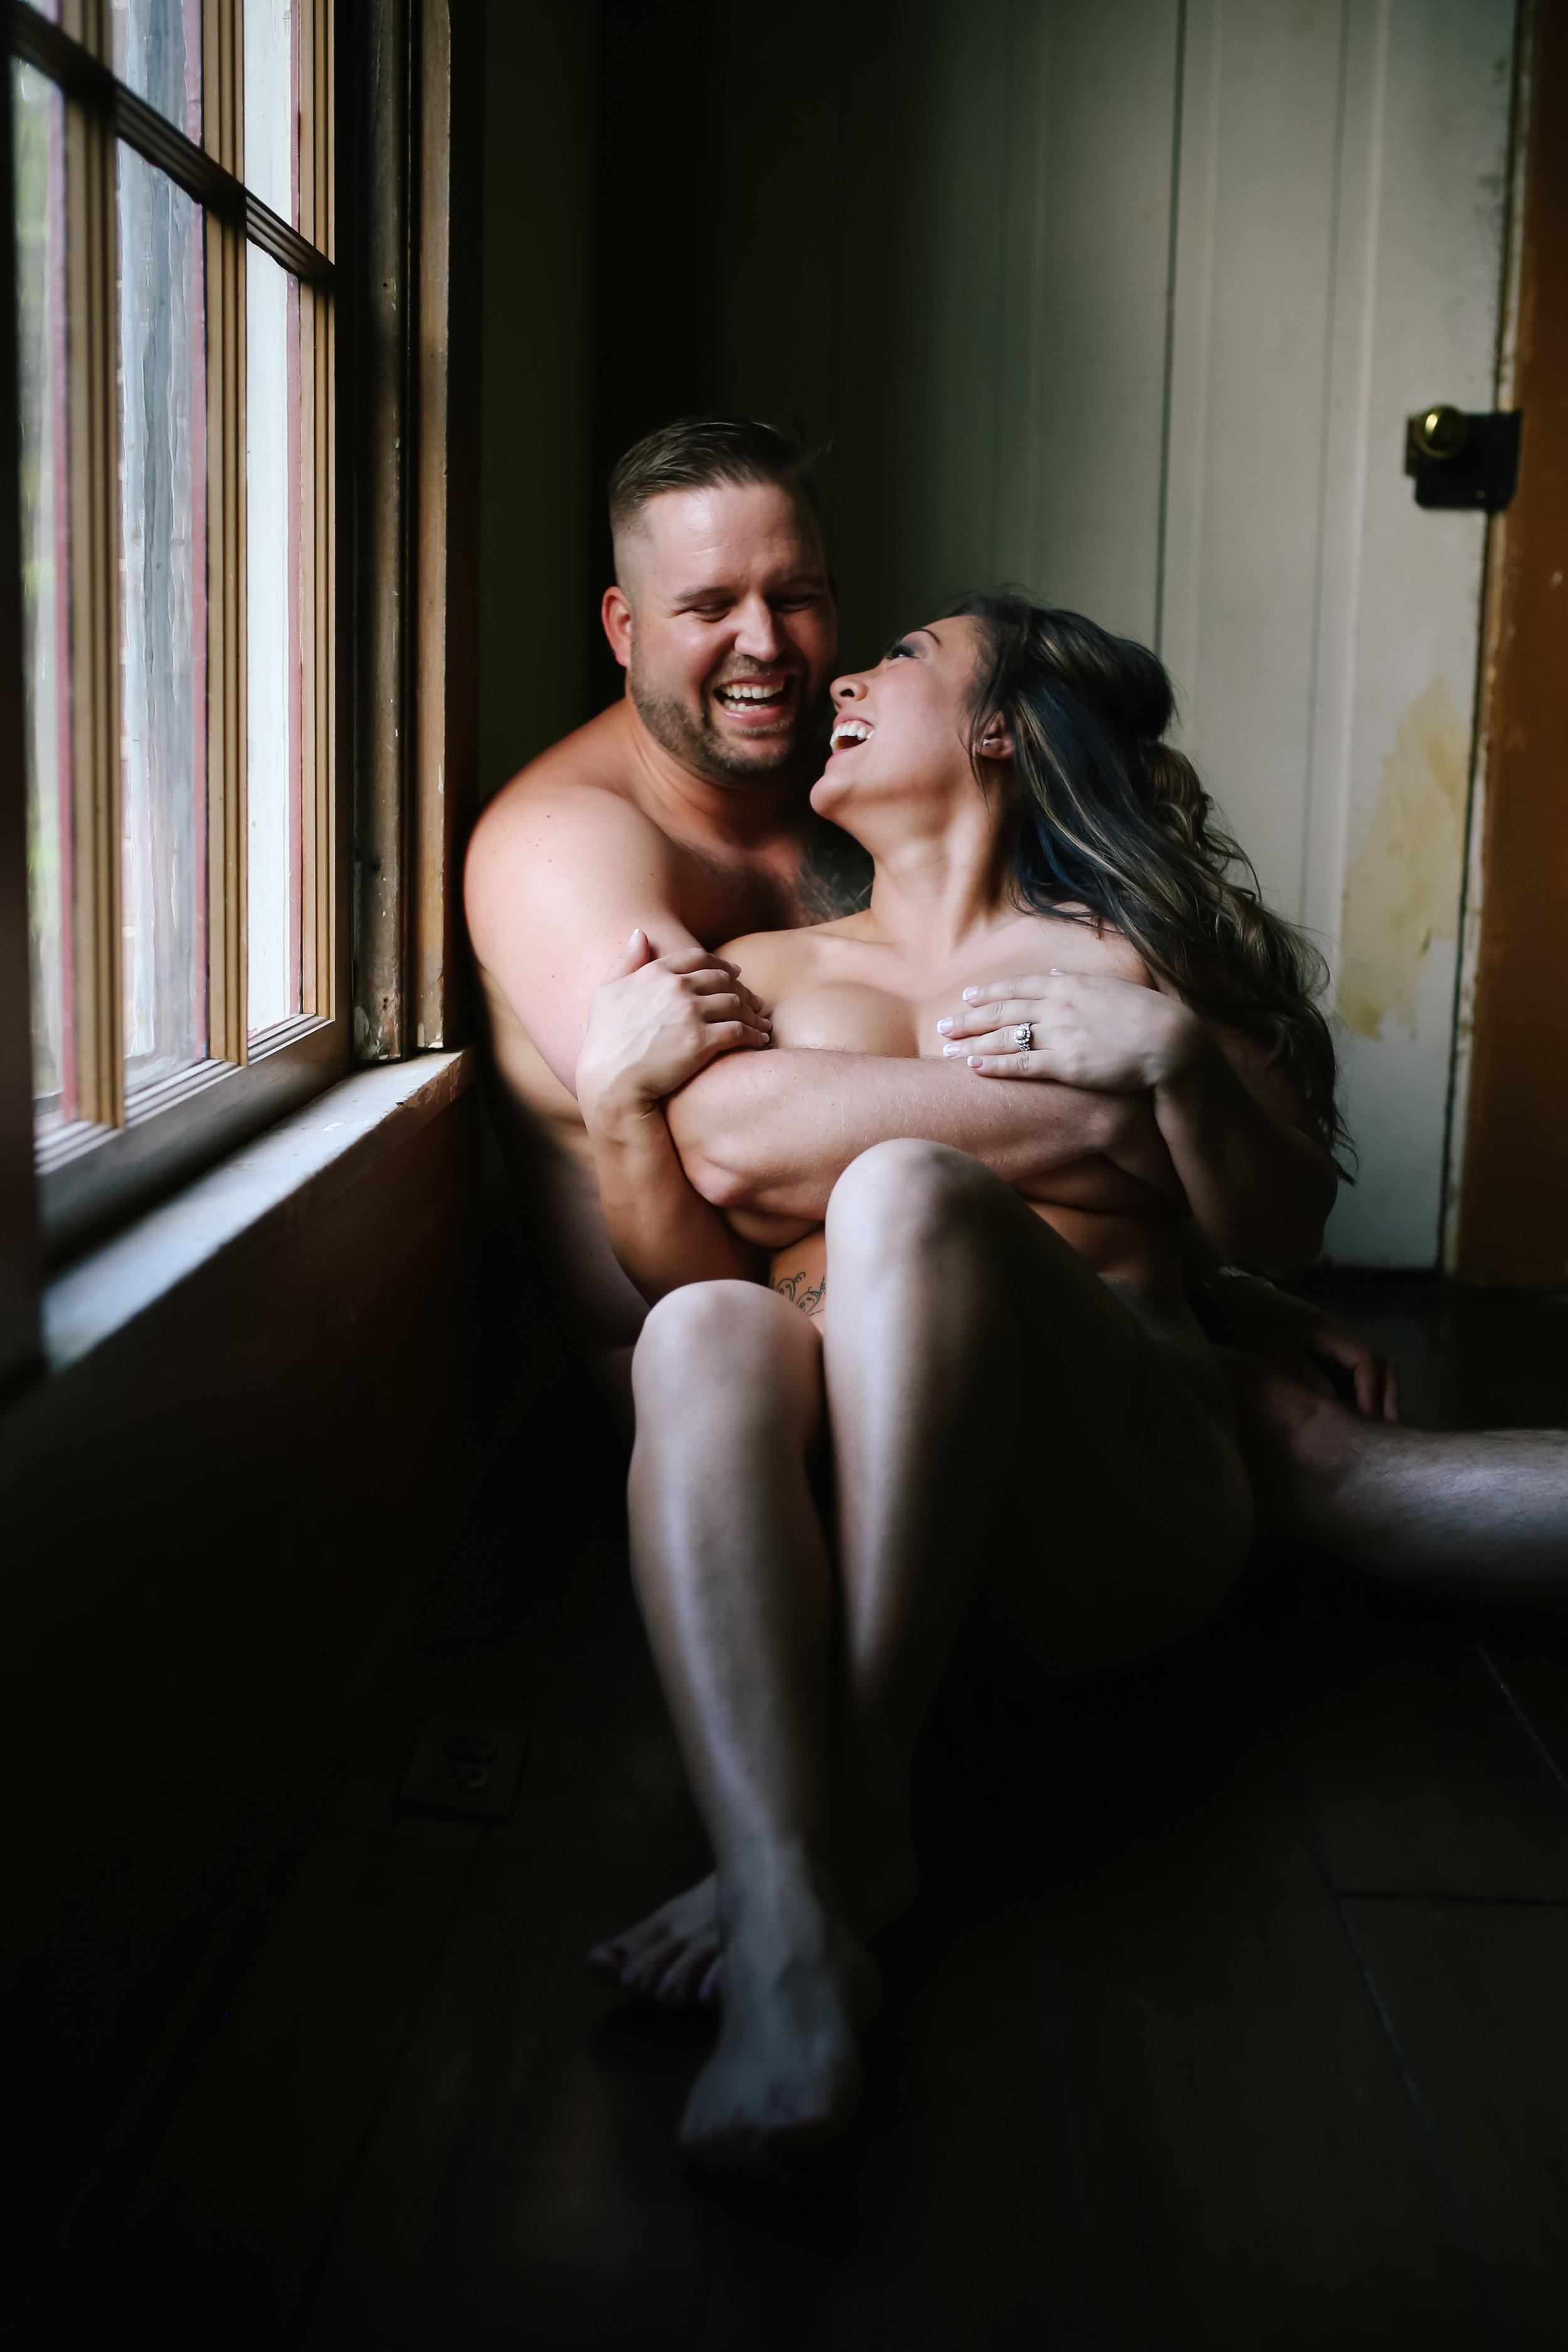 nudist photography